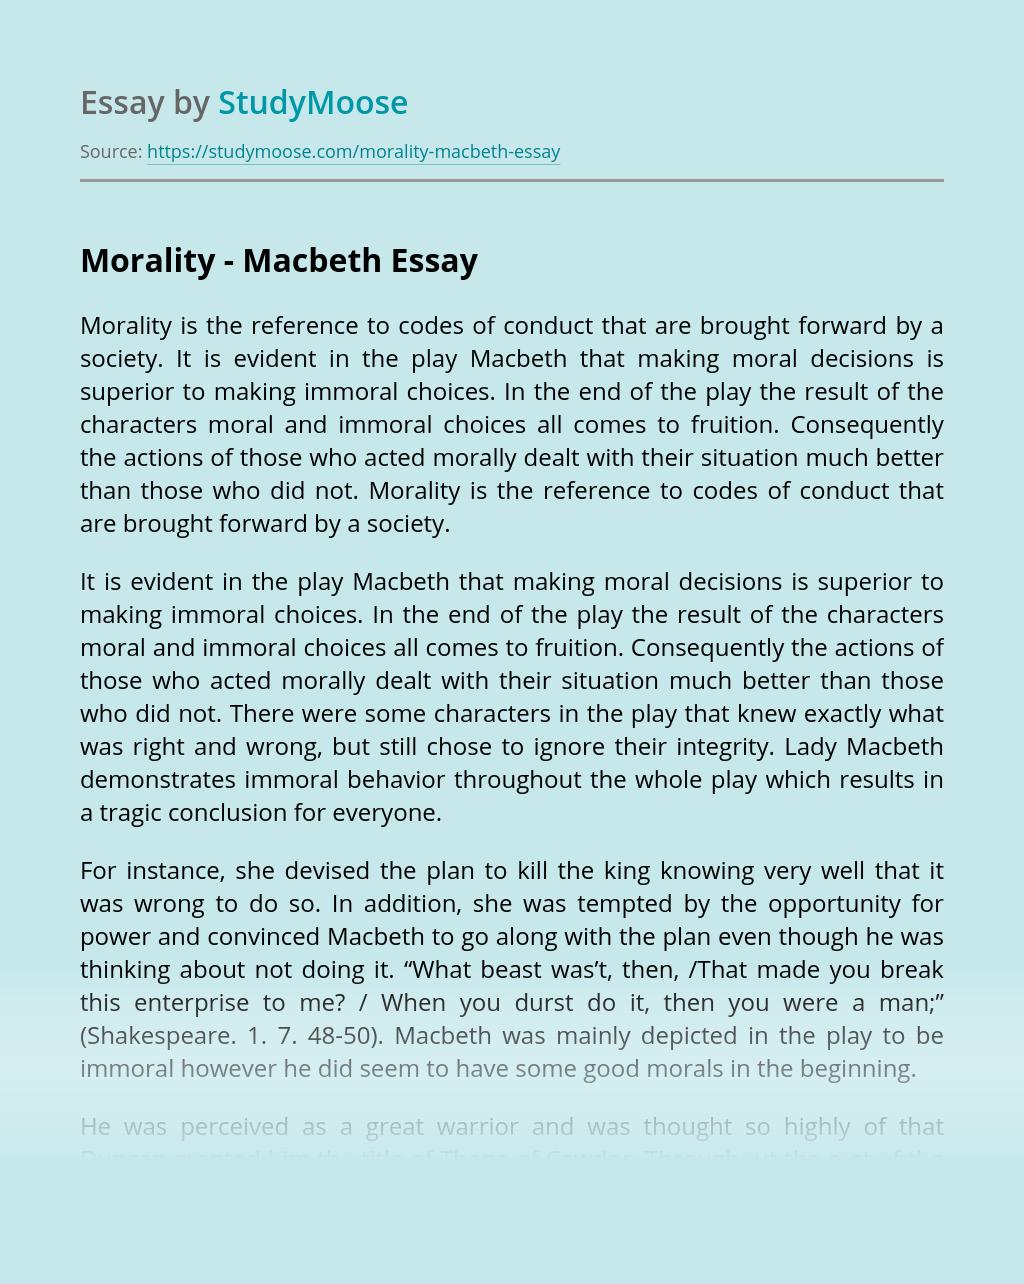 Morality - Macbeth